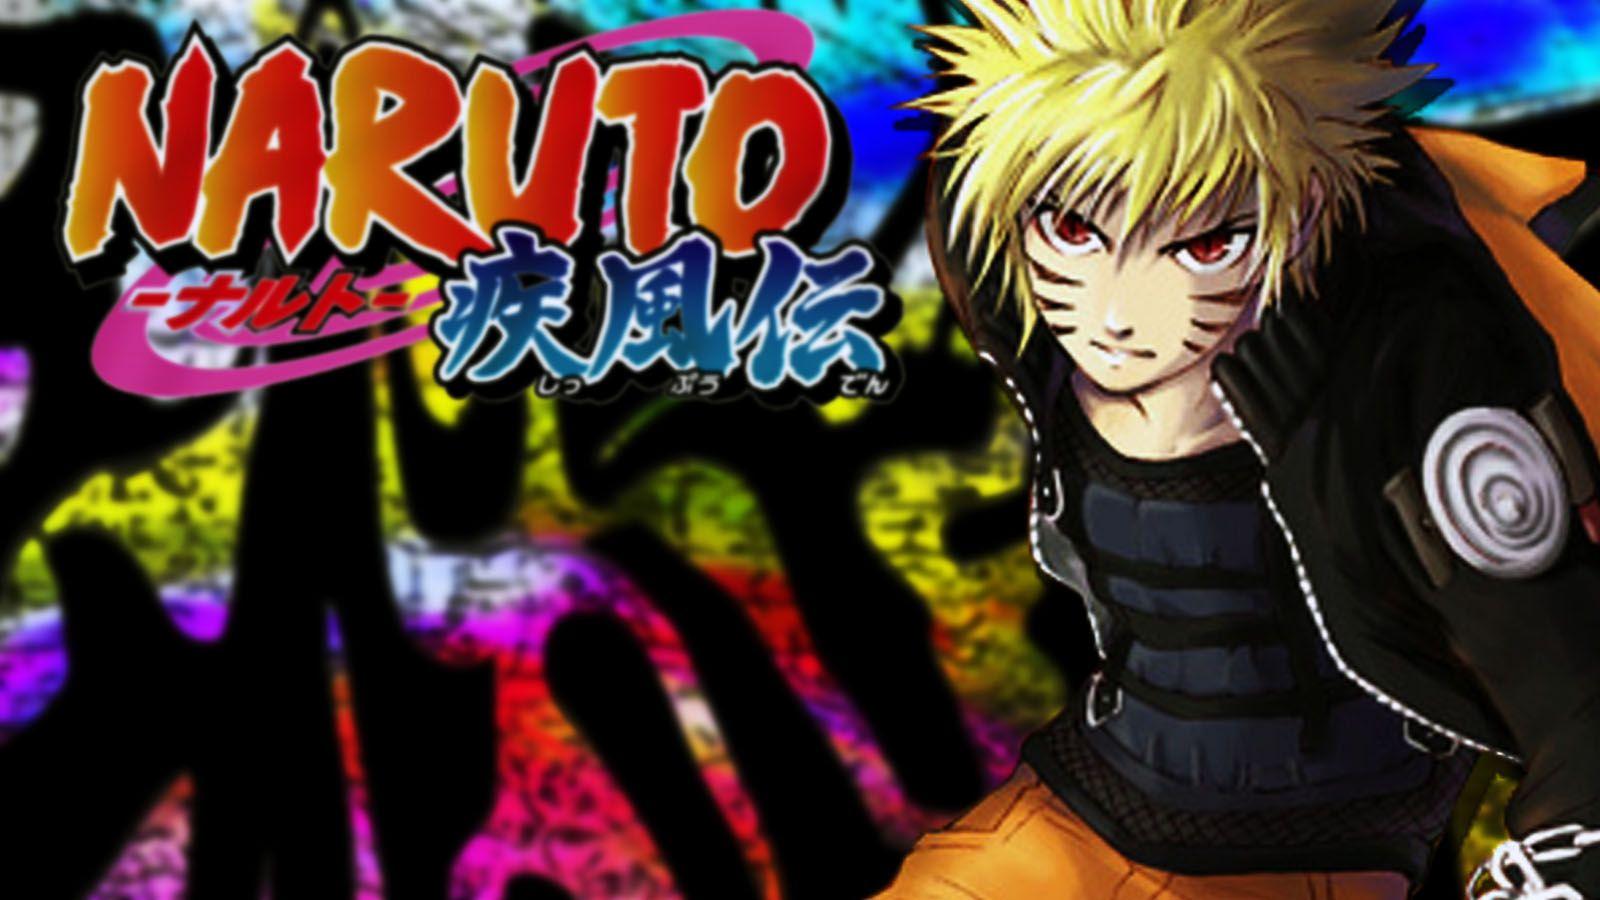 Most Inspiring Wallpaper Naruto Original - Download-Wallpapers-Naruto-Shippuden-020  Picture_578365.jpg